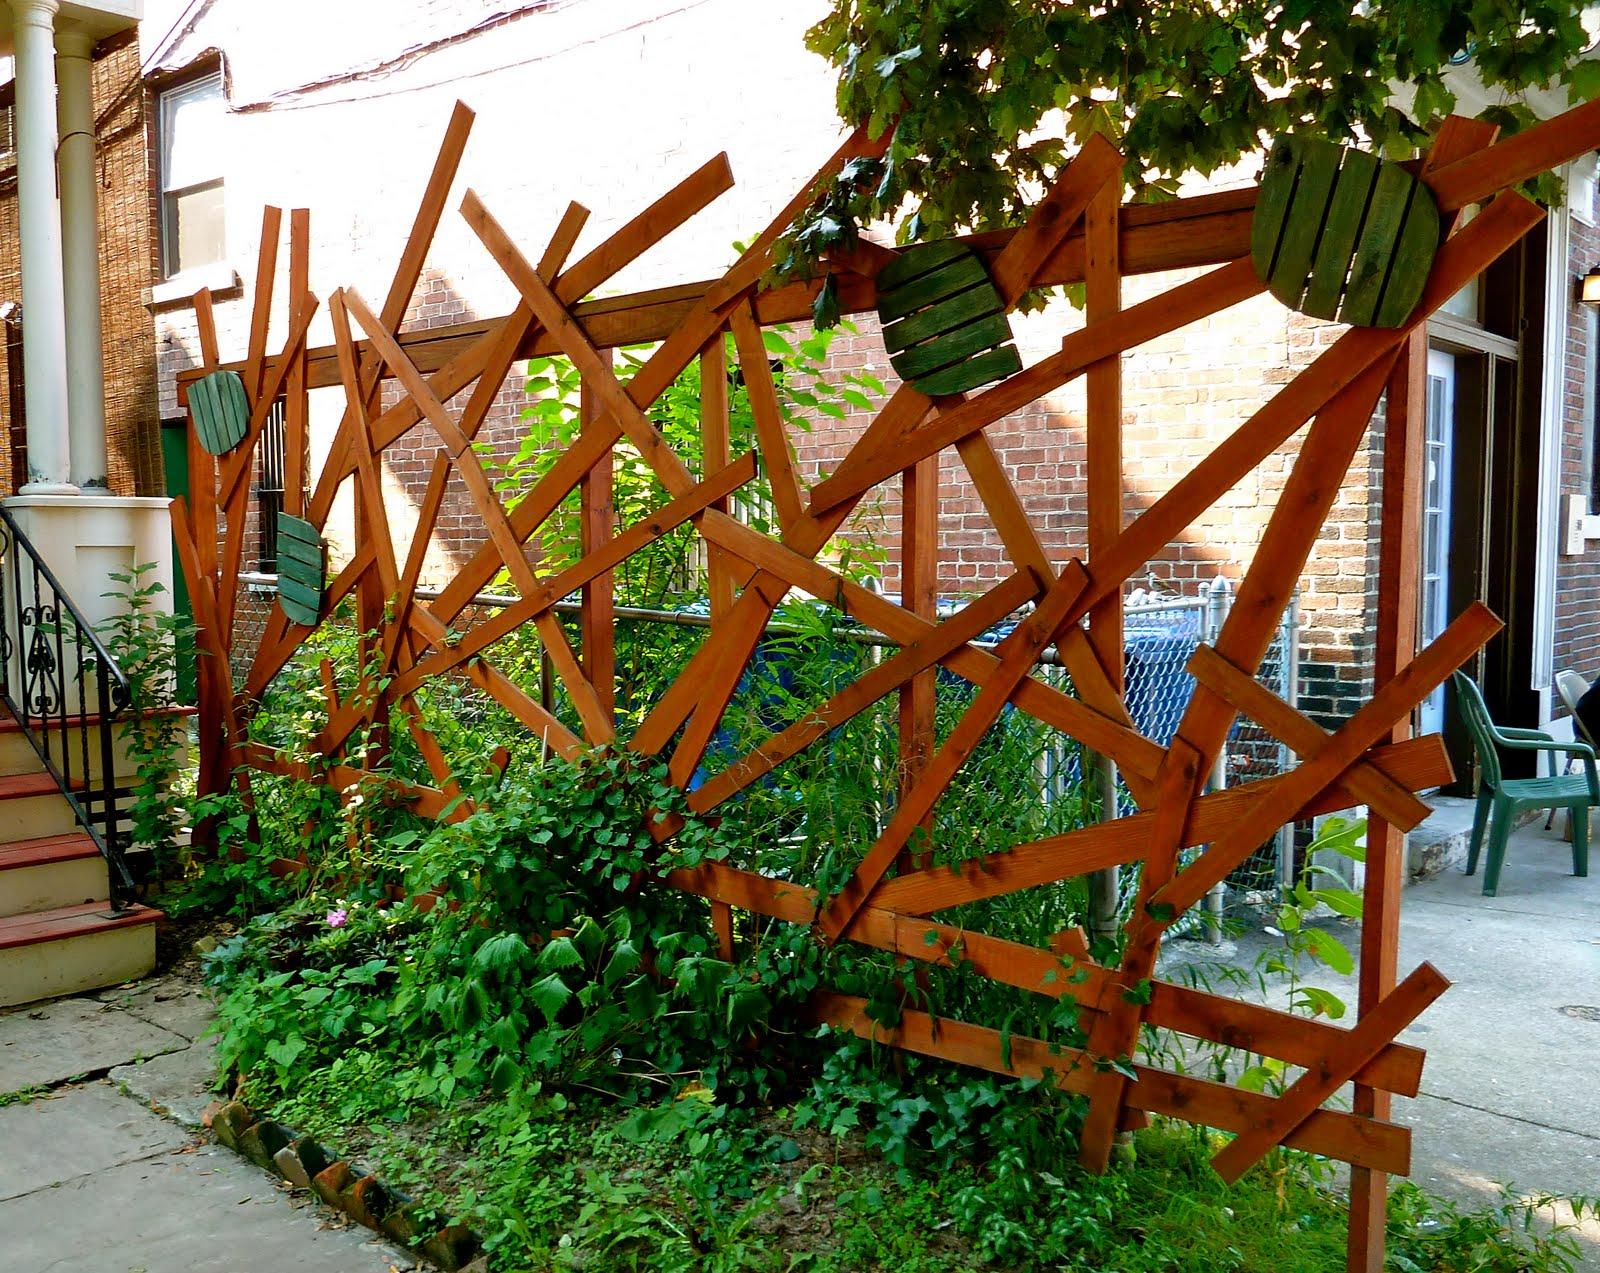 1000 images about trellis on pinterest trellis ideas for Wire garden trellis designs